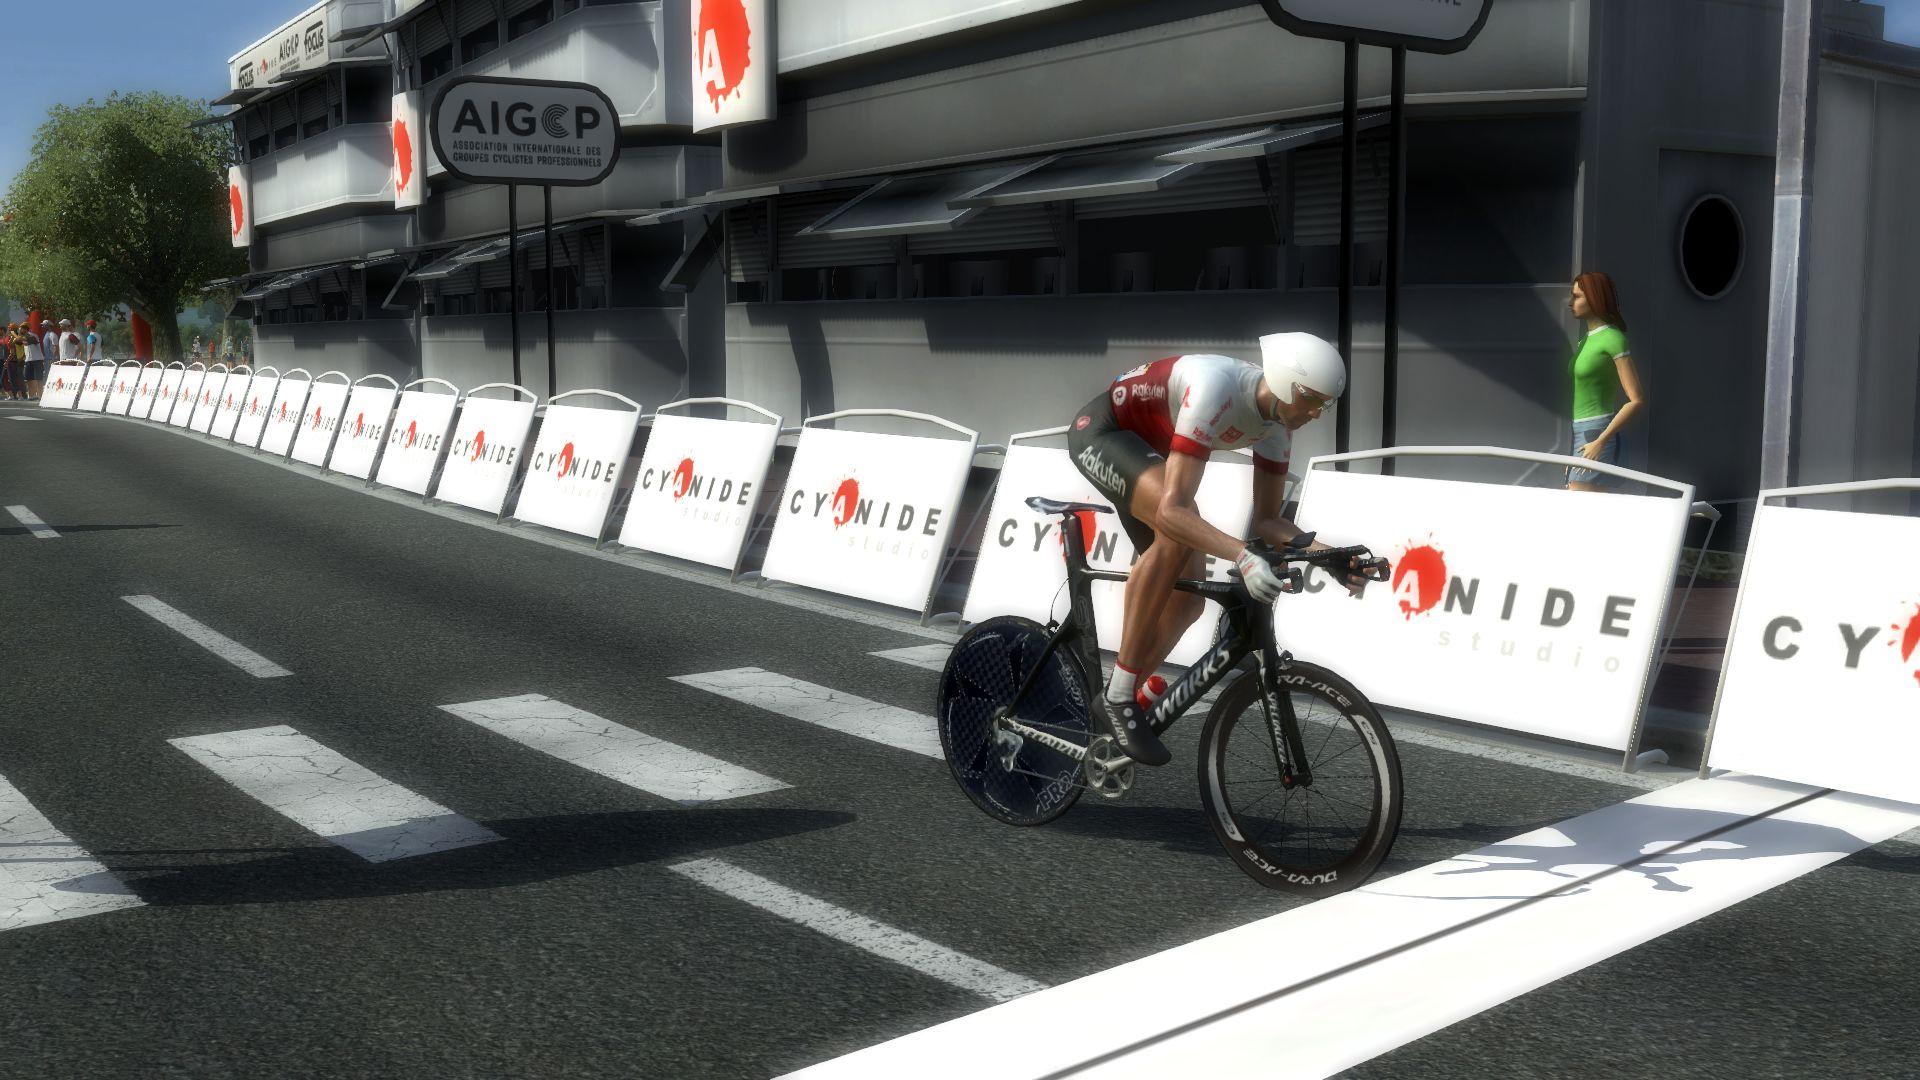 pcmdaily.com/images/mg/2019/Races/C1/Bayern/S4/mg19_bay_s04_43.jpg